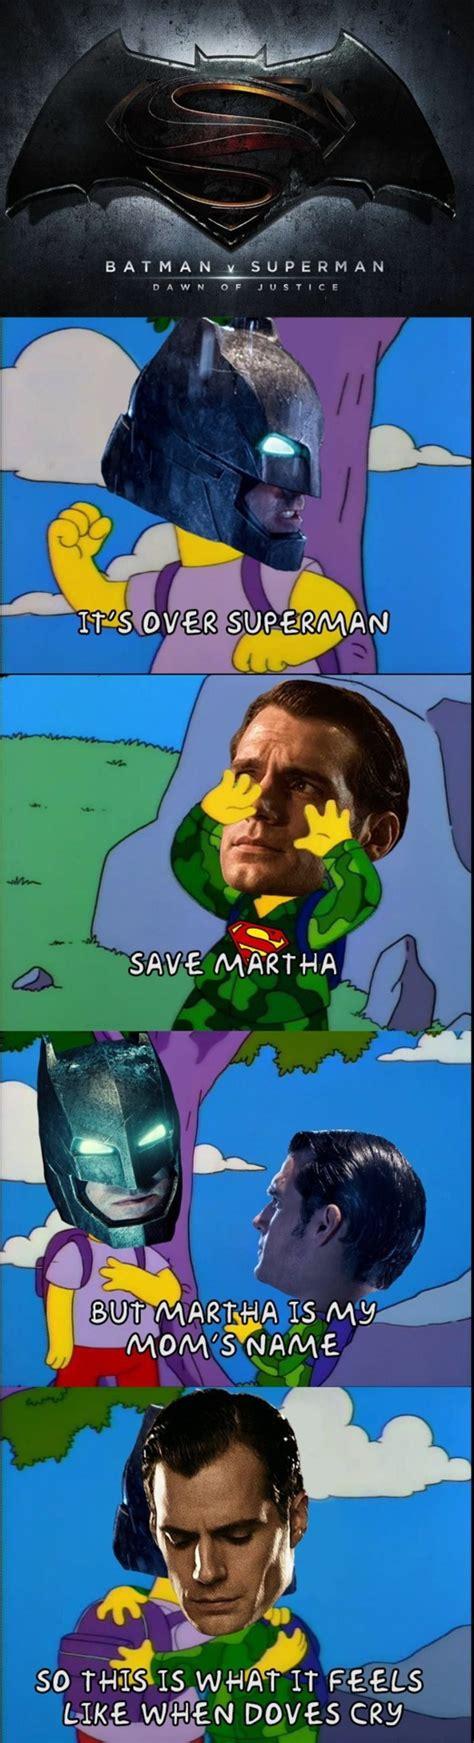 Martha Meme - mcu has its memes but dccu has martha gen discussion